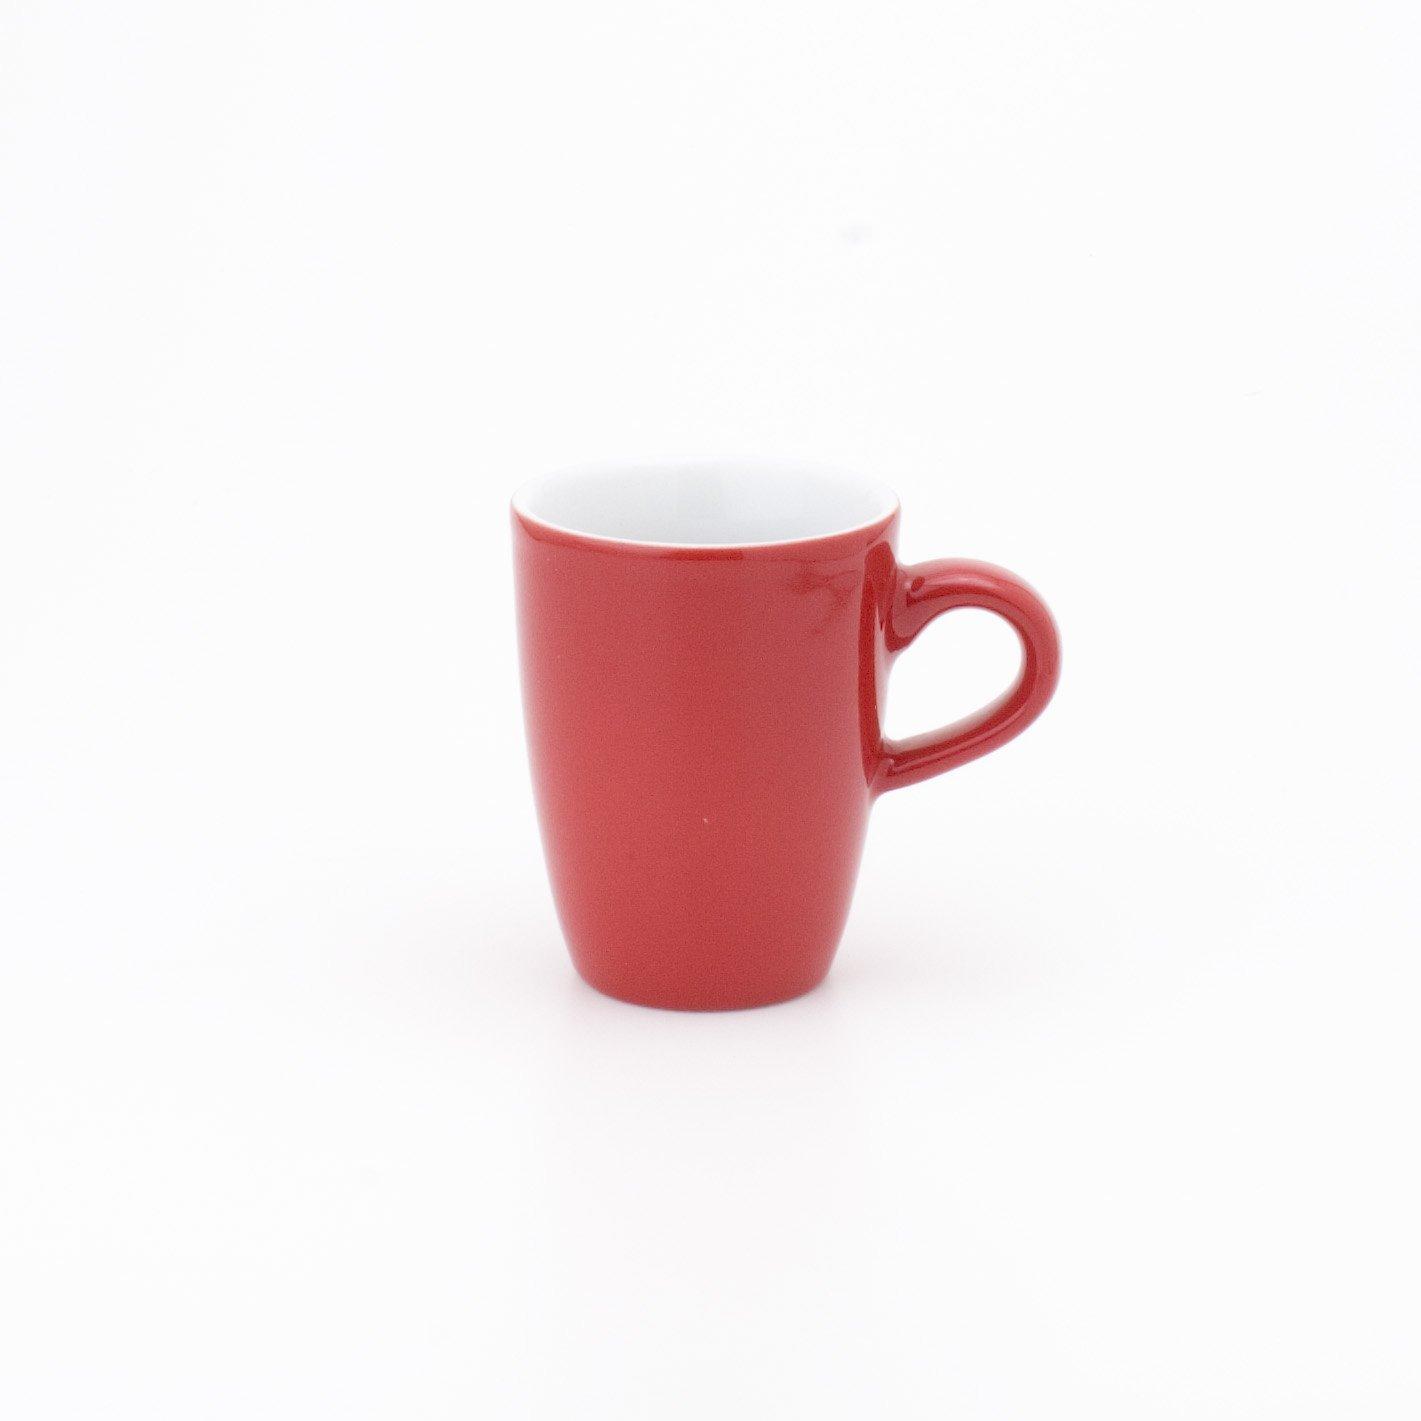 hoch PRONTO COLORE H.Nr. 574732A60005C 0,10 l rot KAHLA Espresso-Obertasse